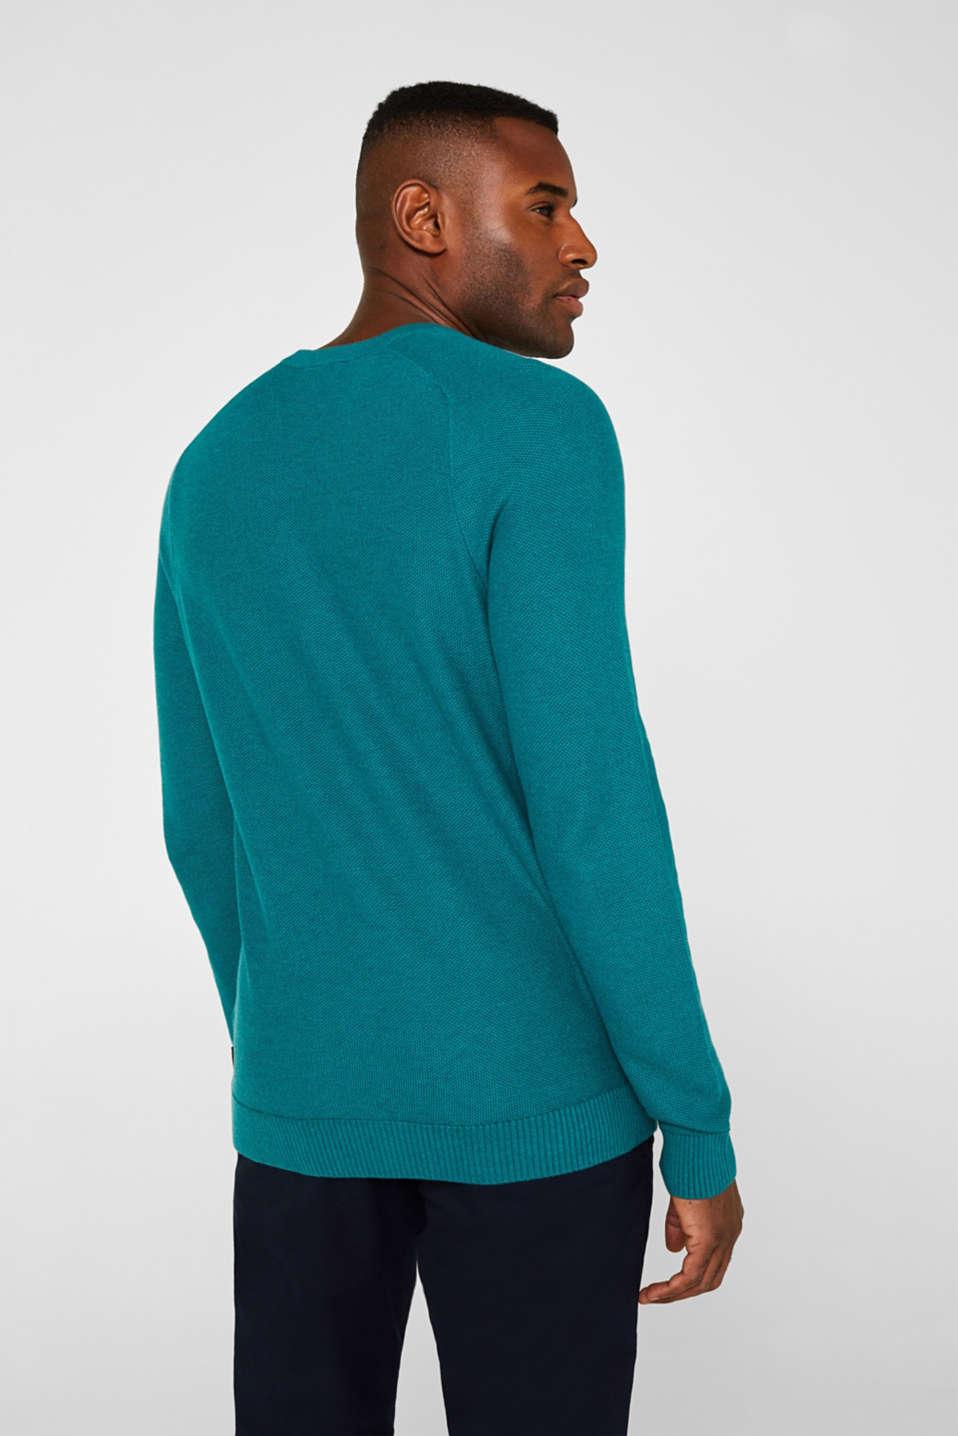 Textured jumper made of 100% cotton, TEAL BLUE 5, detail image number 3